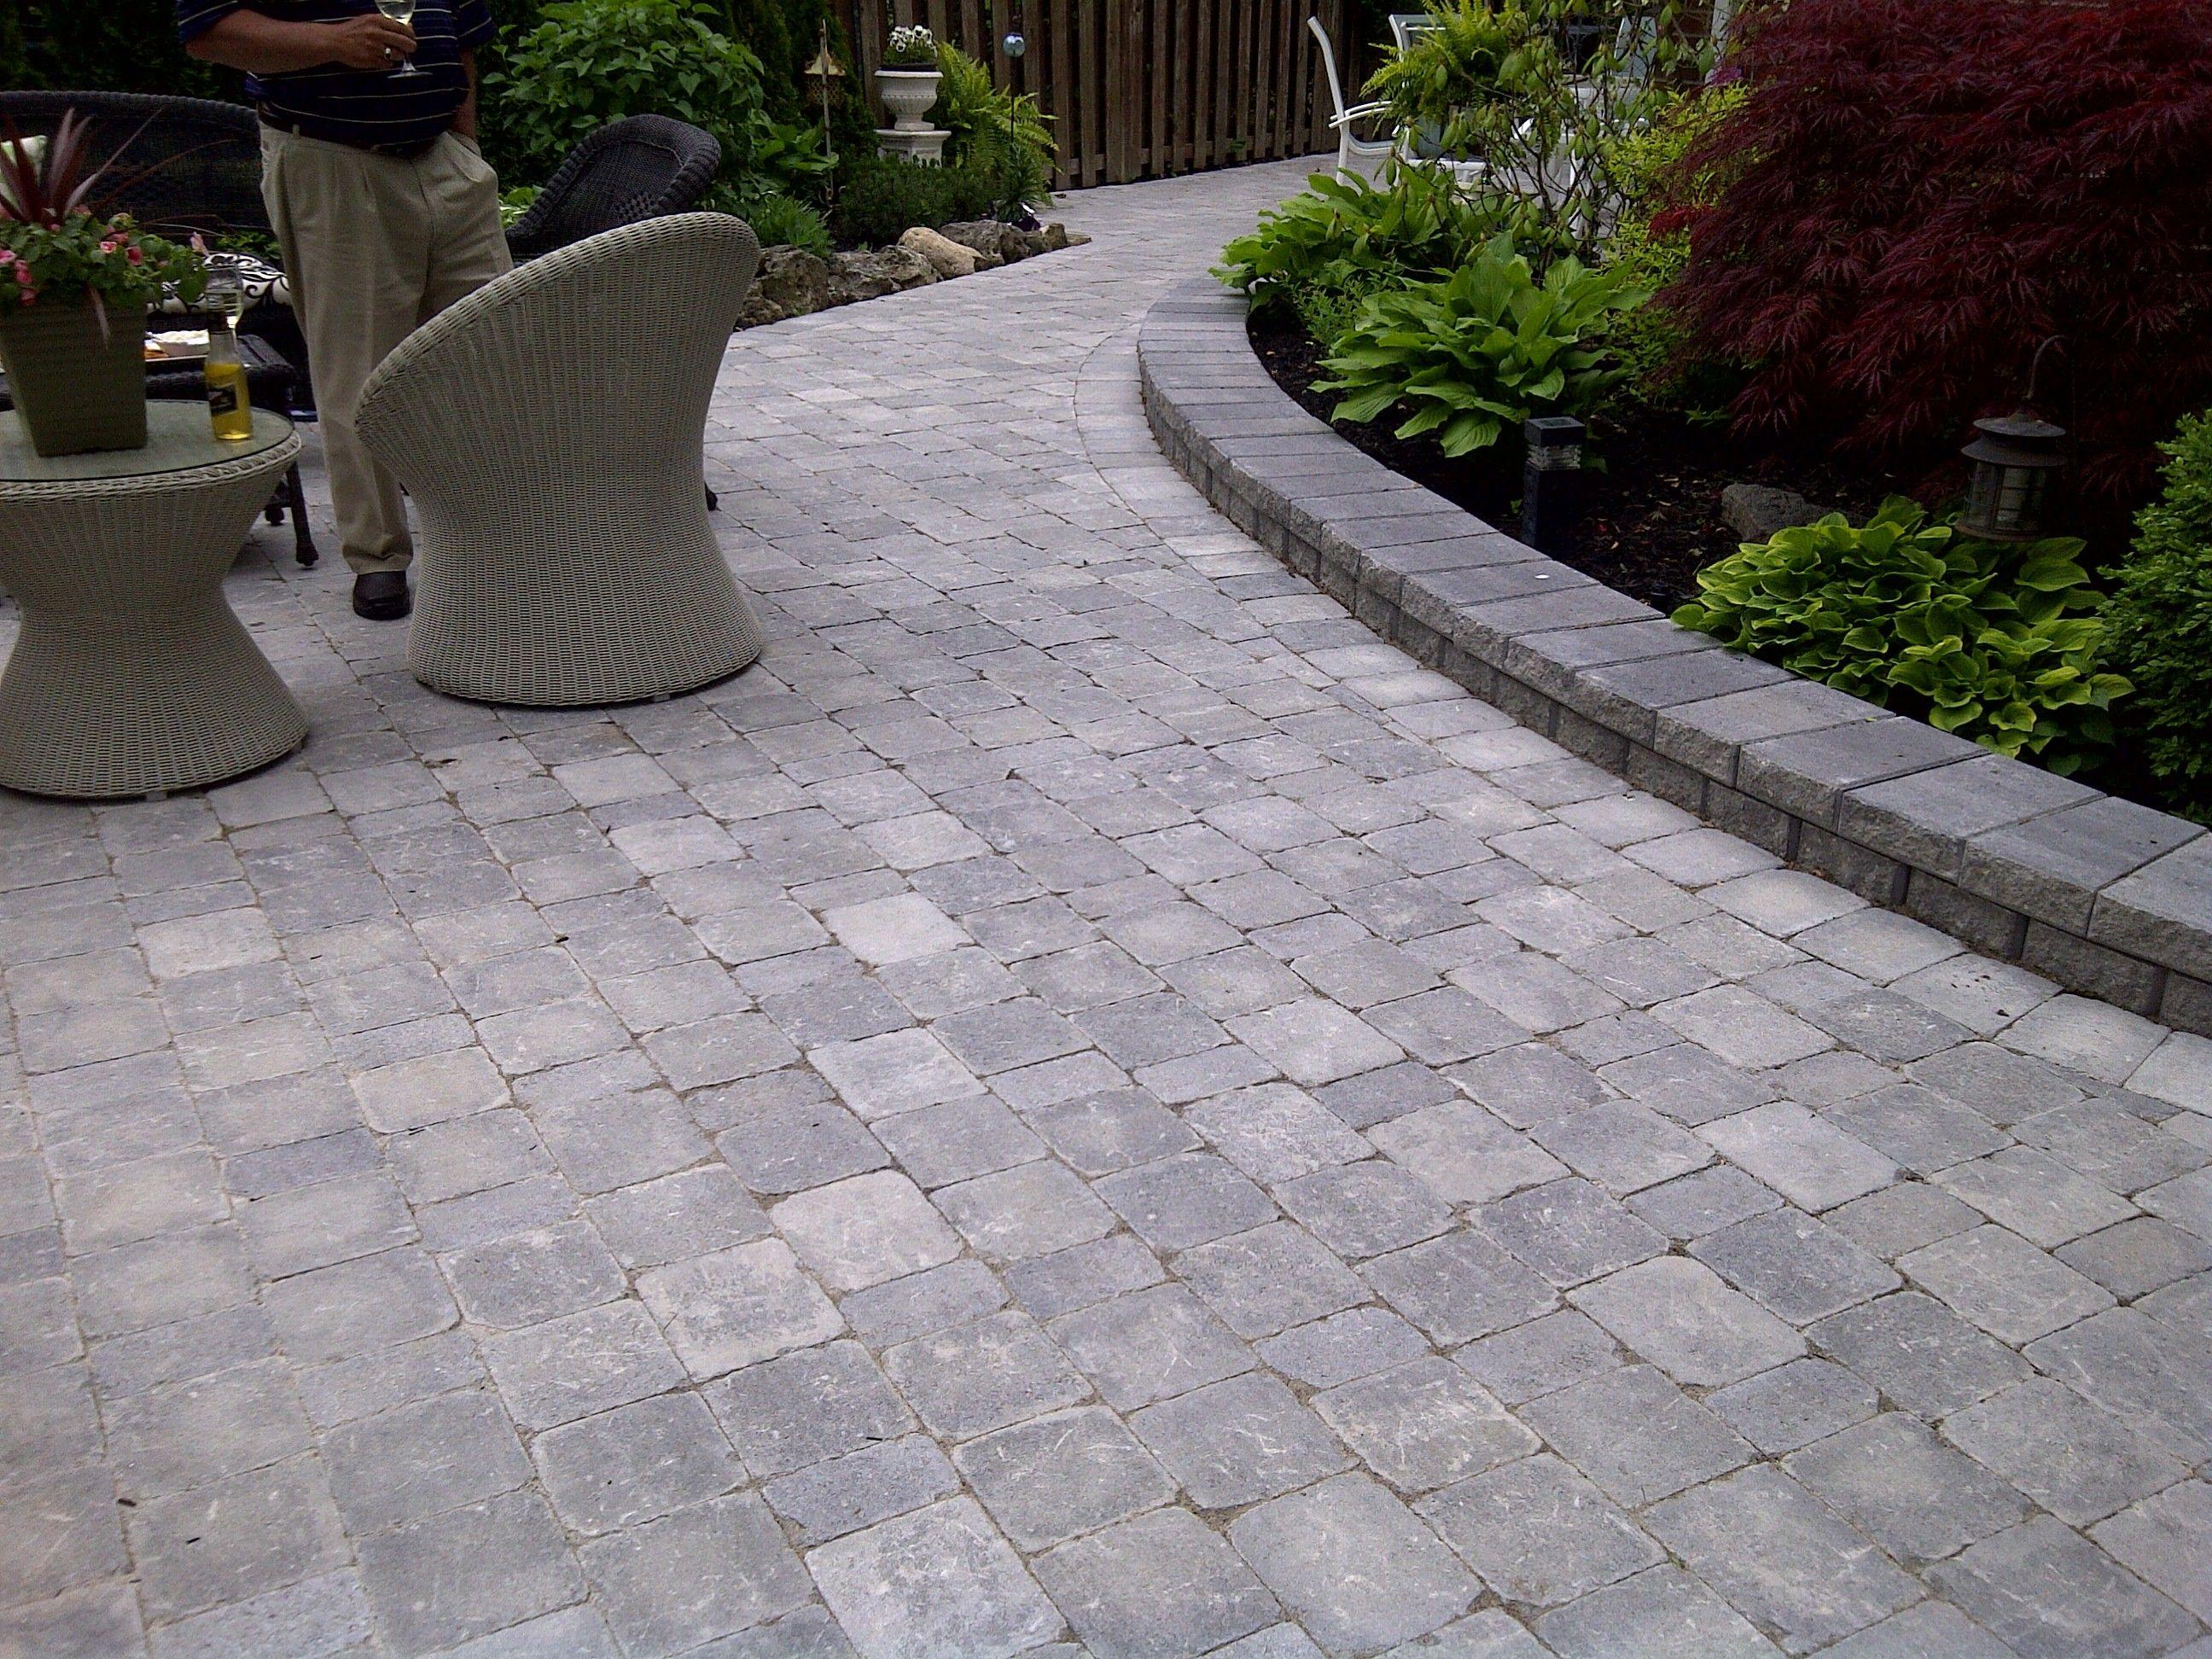 Interlocking stone patio using Brussels block Unilock ... on Unilock Patio Ideas id=52691